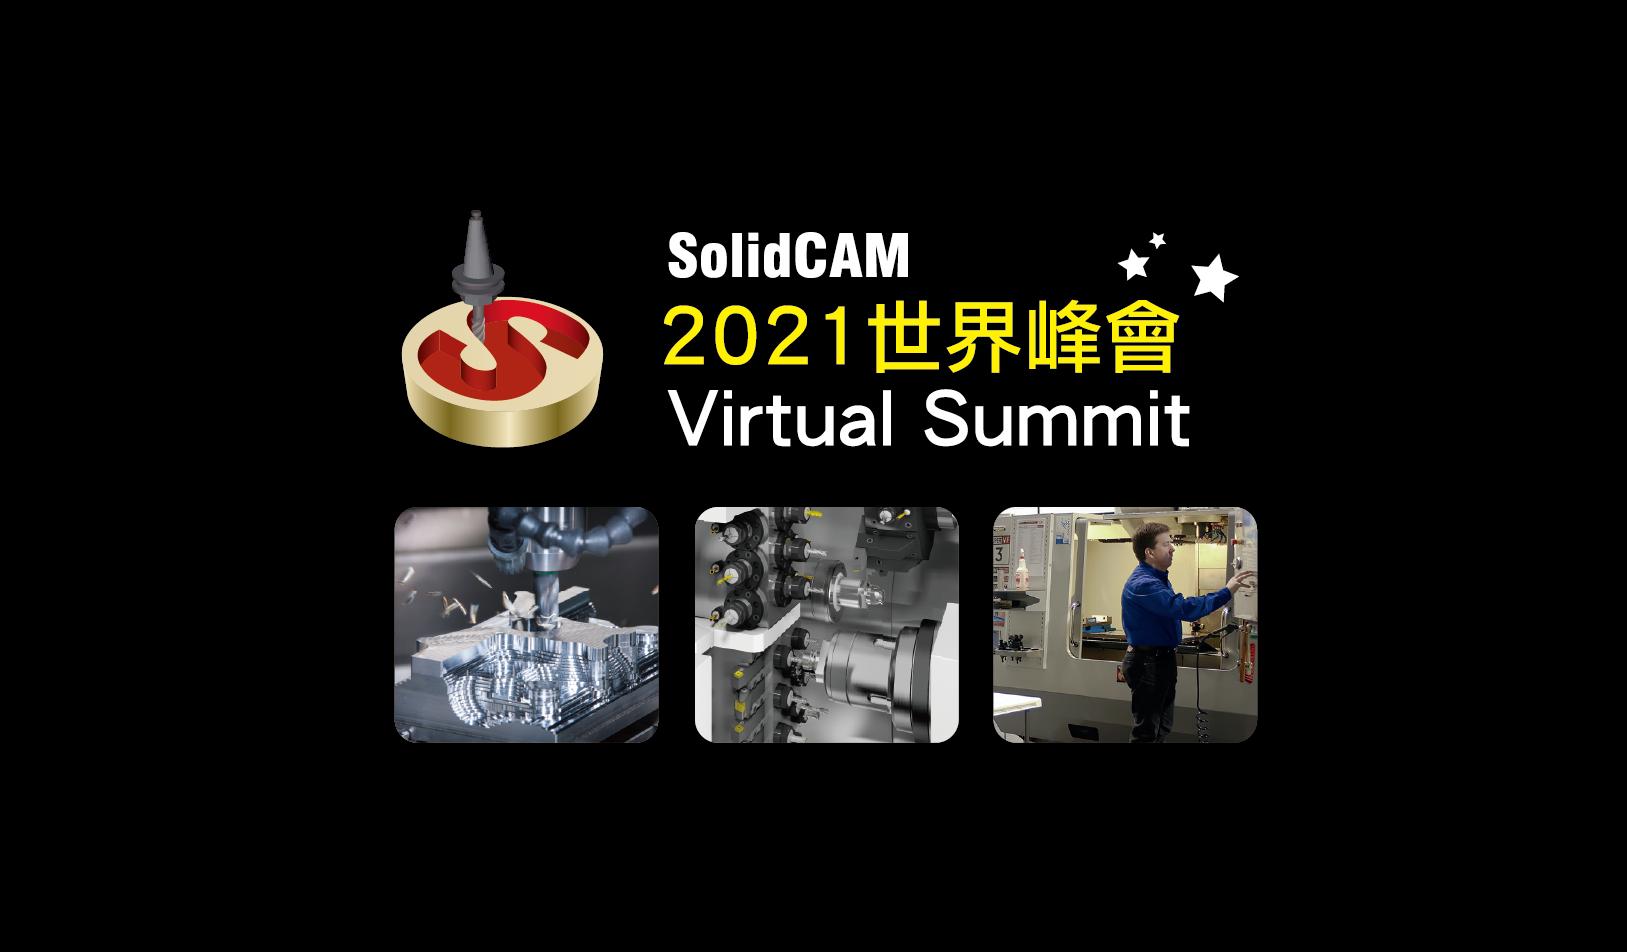 SolidCAM 2021 世界峰會(線上)